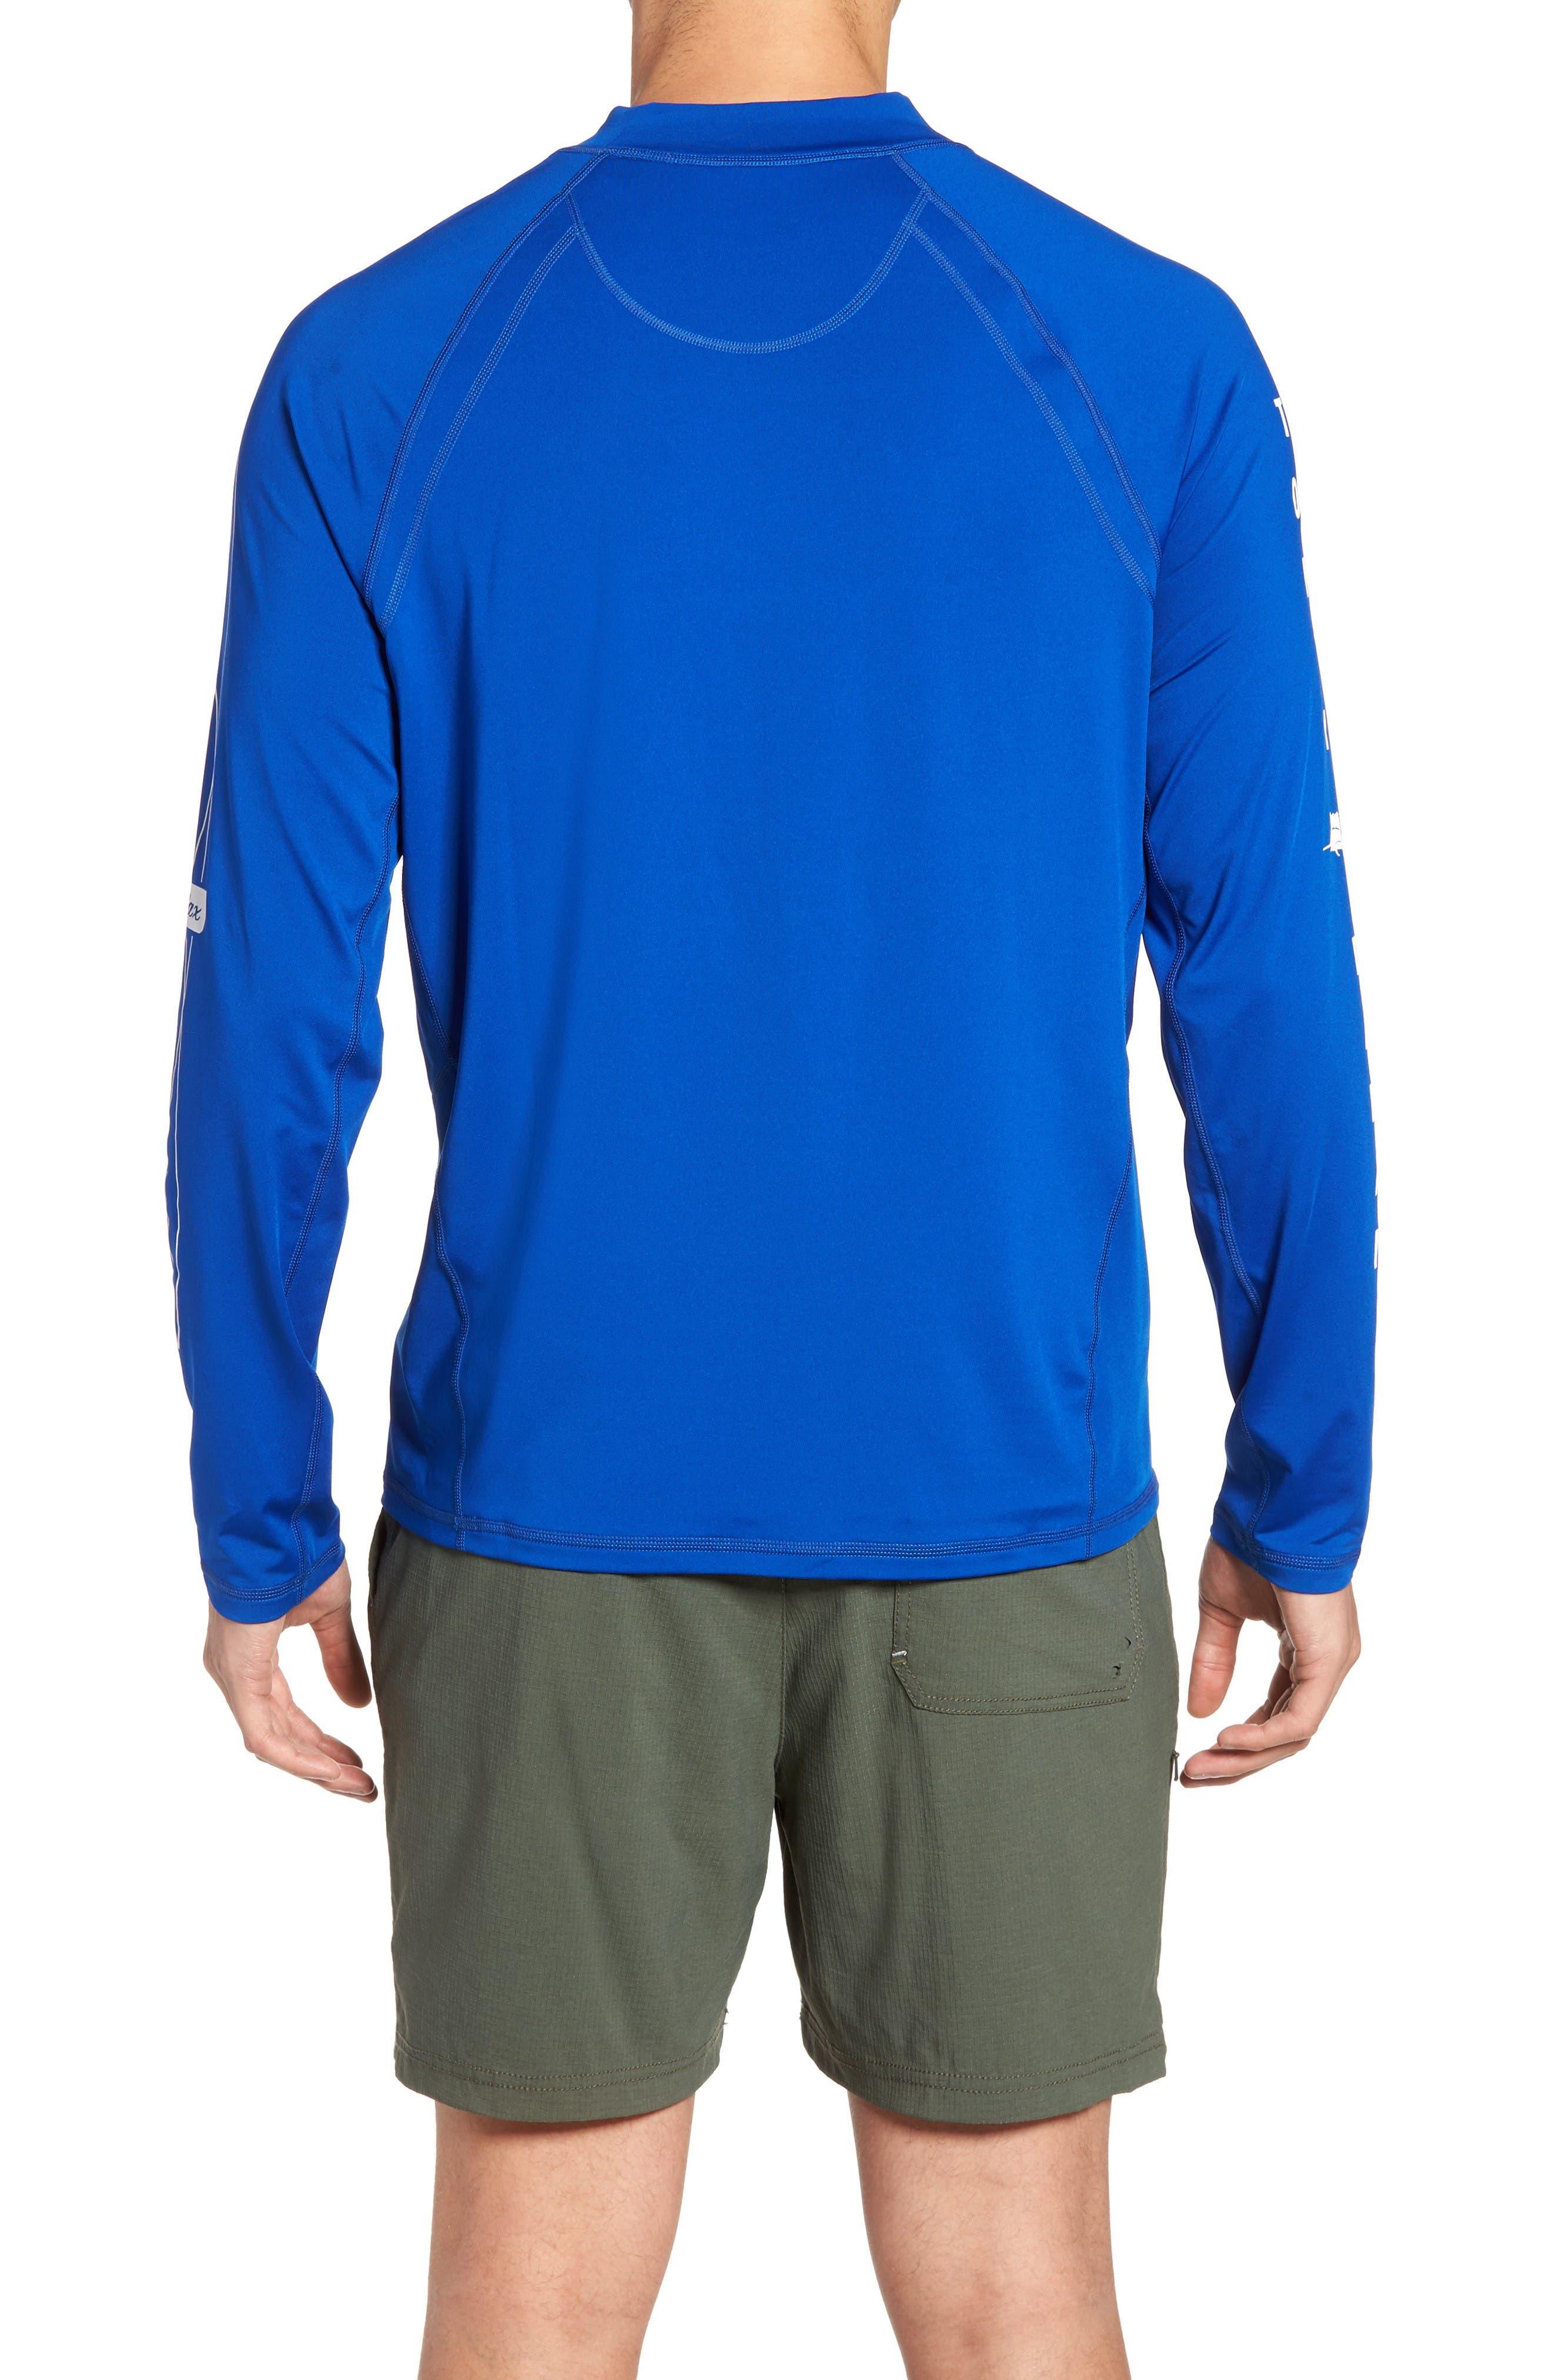 Beach Break Surf Shirt,                             Alternate thumbnail 2, color,                             Old Royal